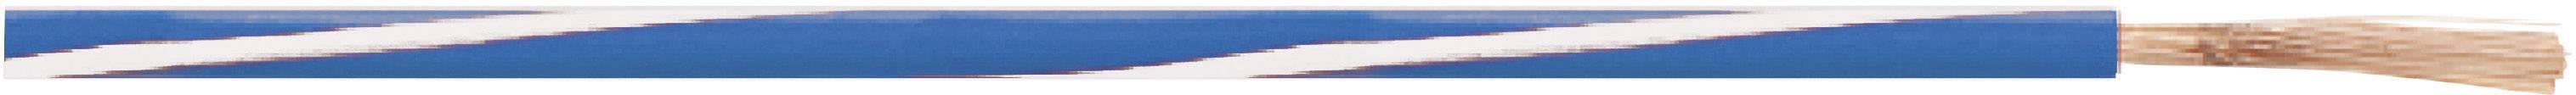 Opletenie / lanko LappKabel 4512222S X05V-K, 1 x 0.75 mm², vonkajší Ø 2.40 mm, metrový tovar, čierna, biela